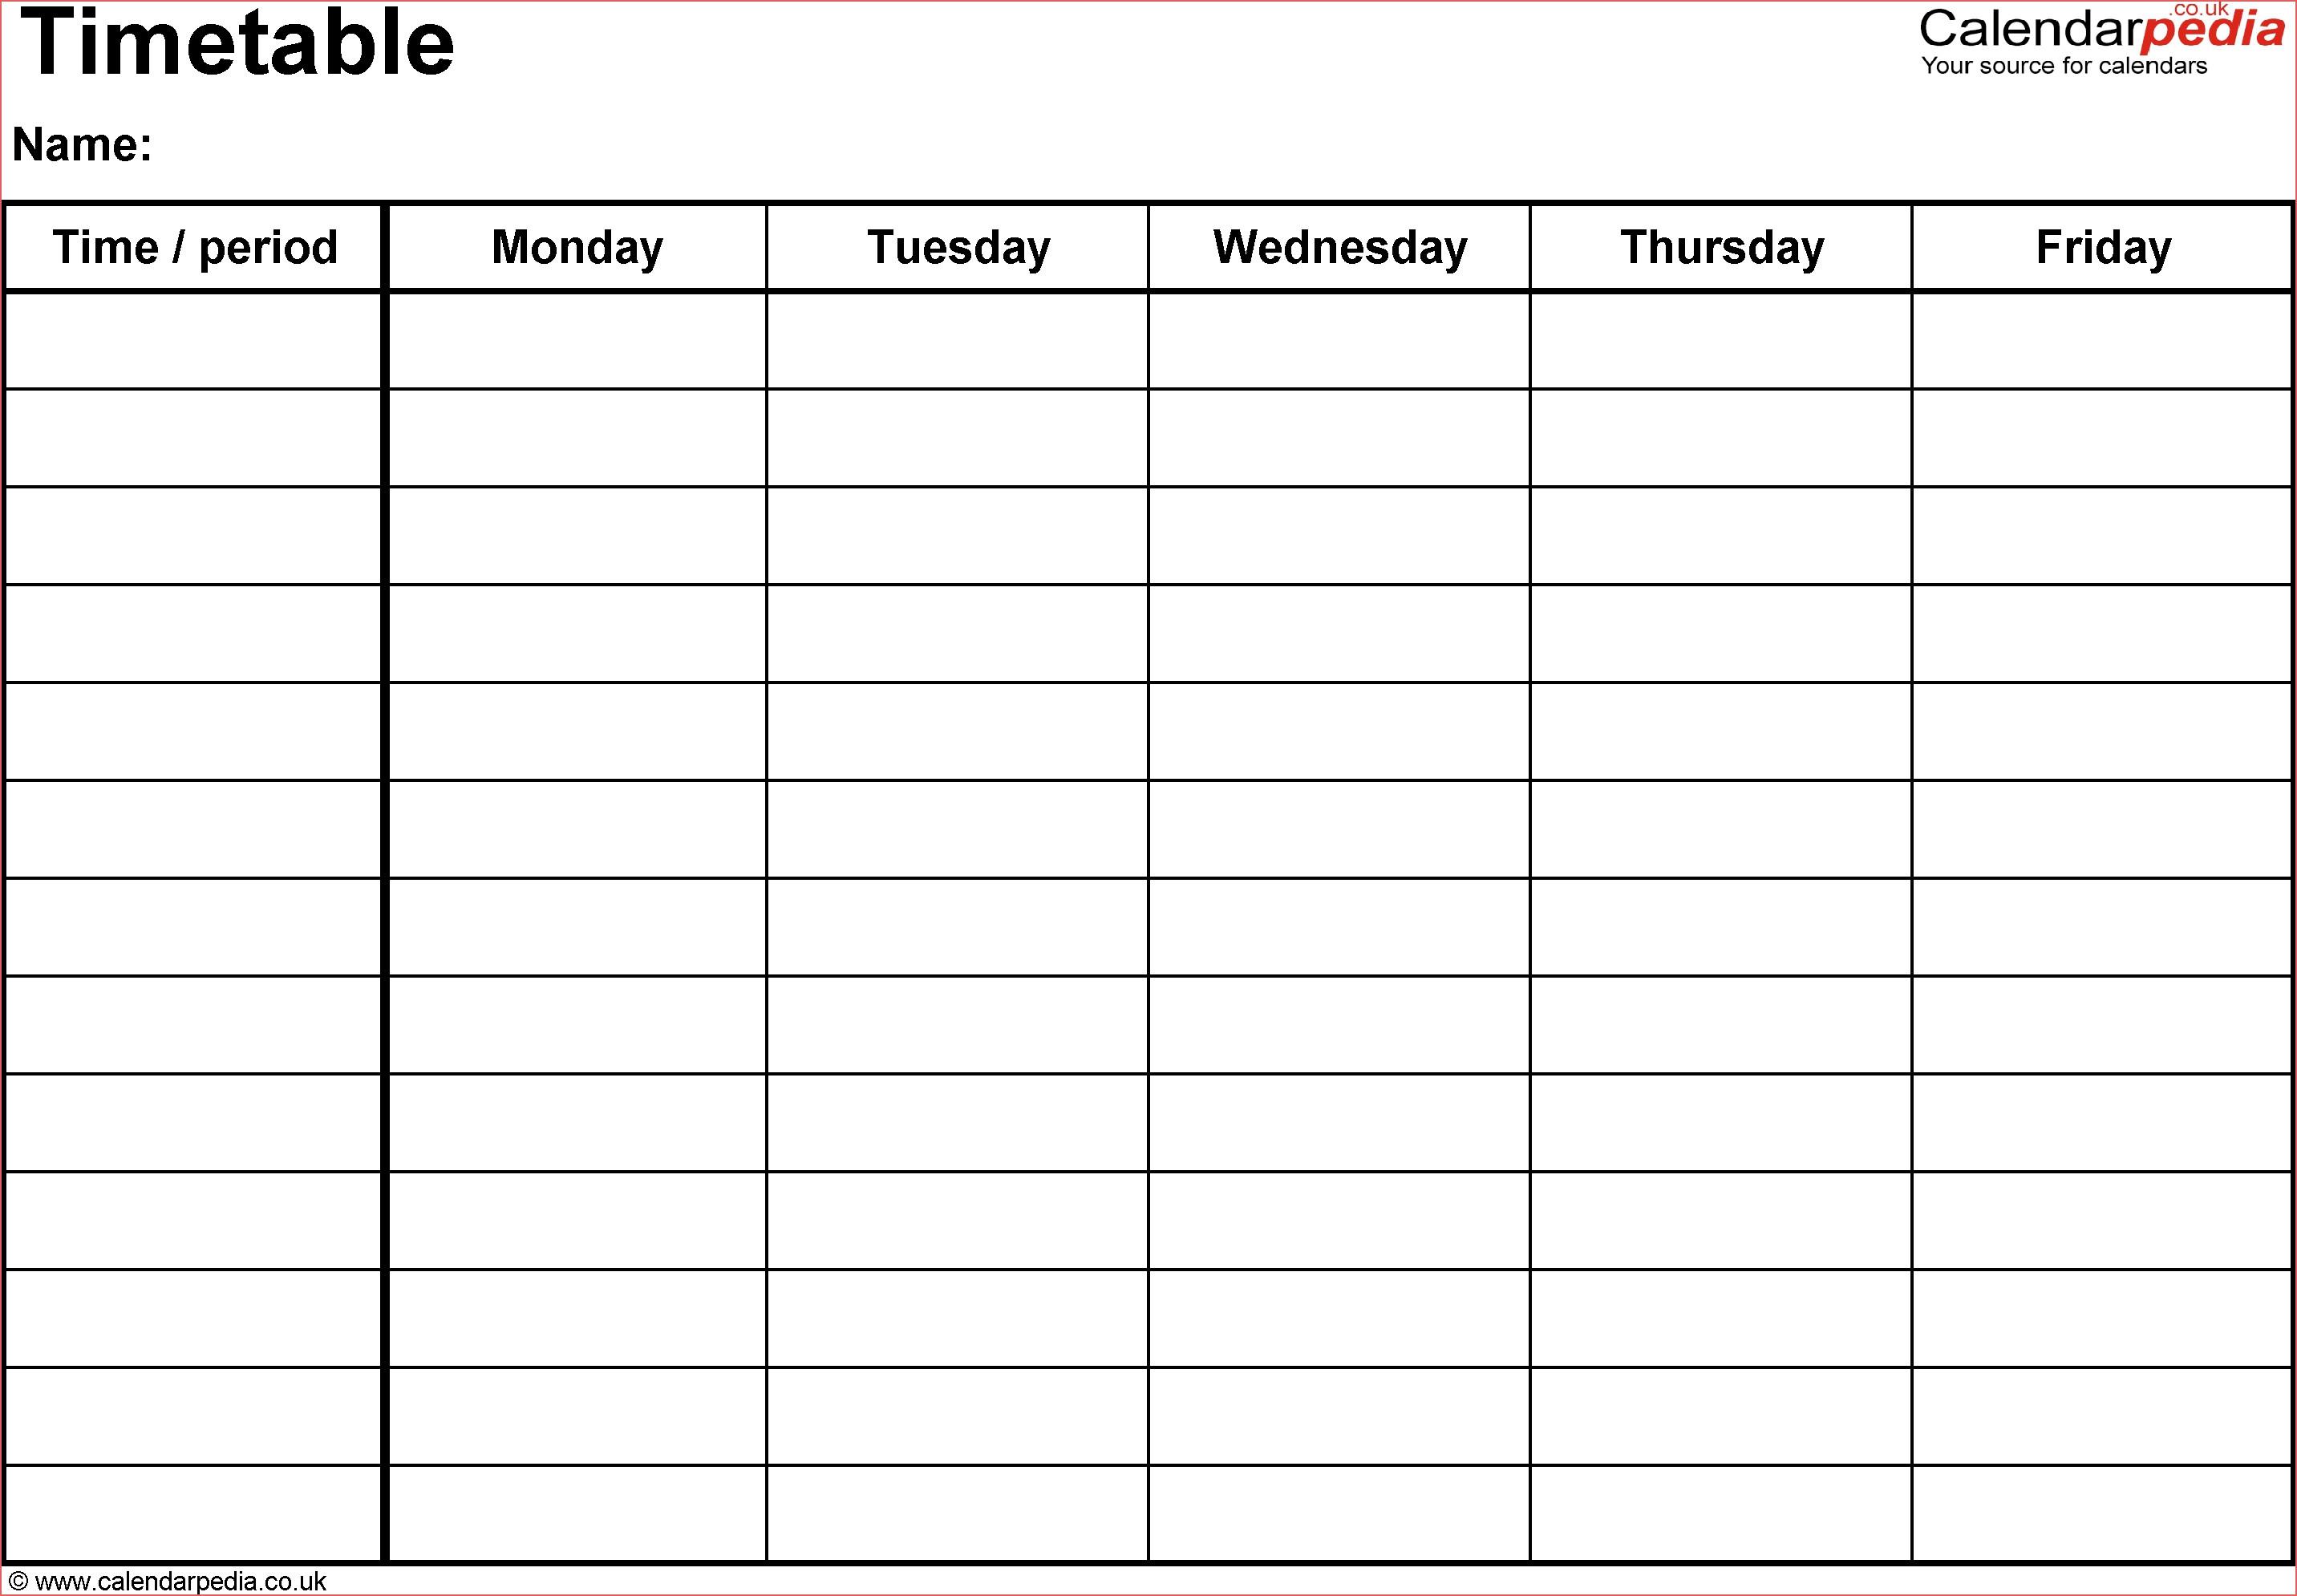 Free 5 Day Calendar Template Online Calendar Templates Printable 5 intended for 5 Day Blank Calendar Template